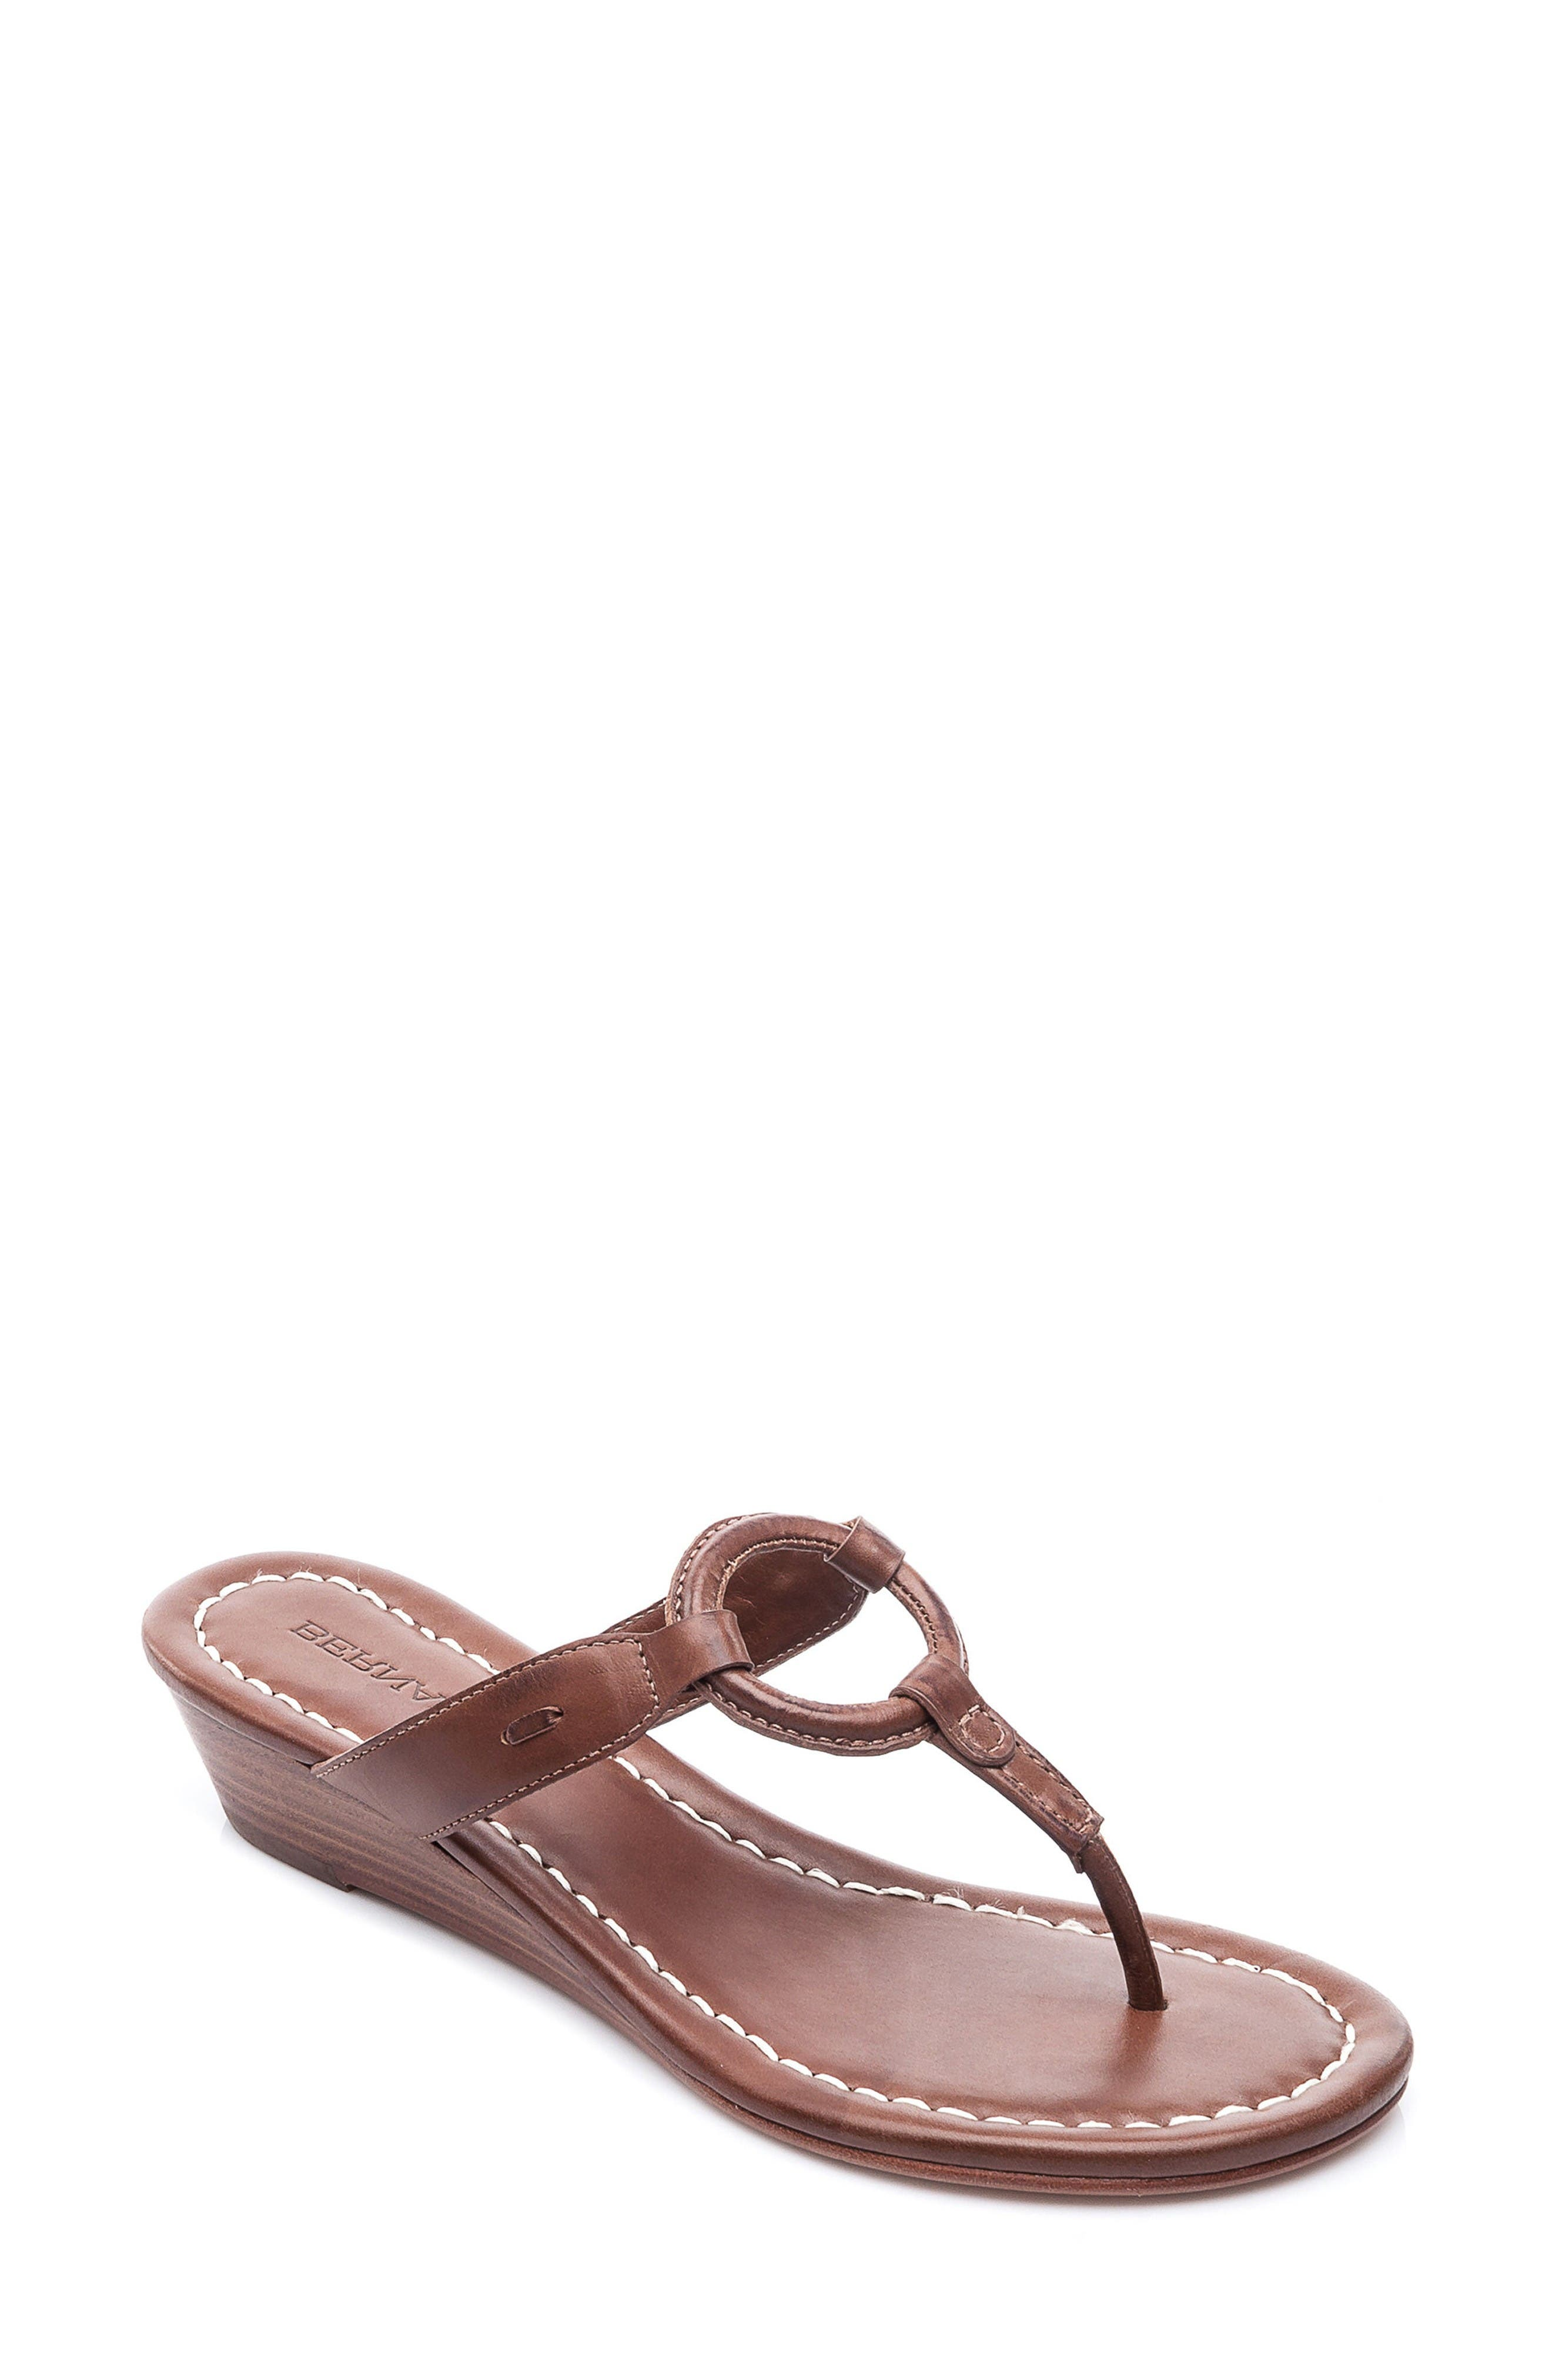 Main Image - Bernardo Matrix Wedge Sandal